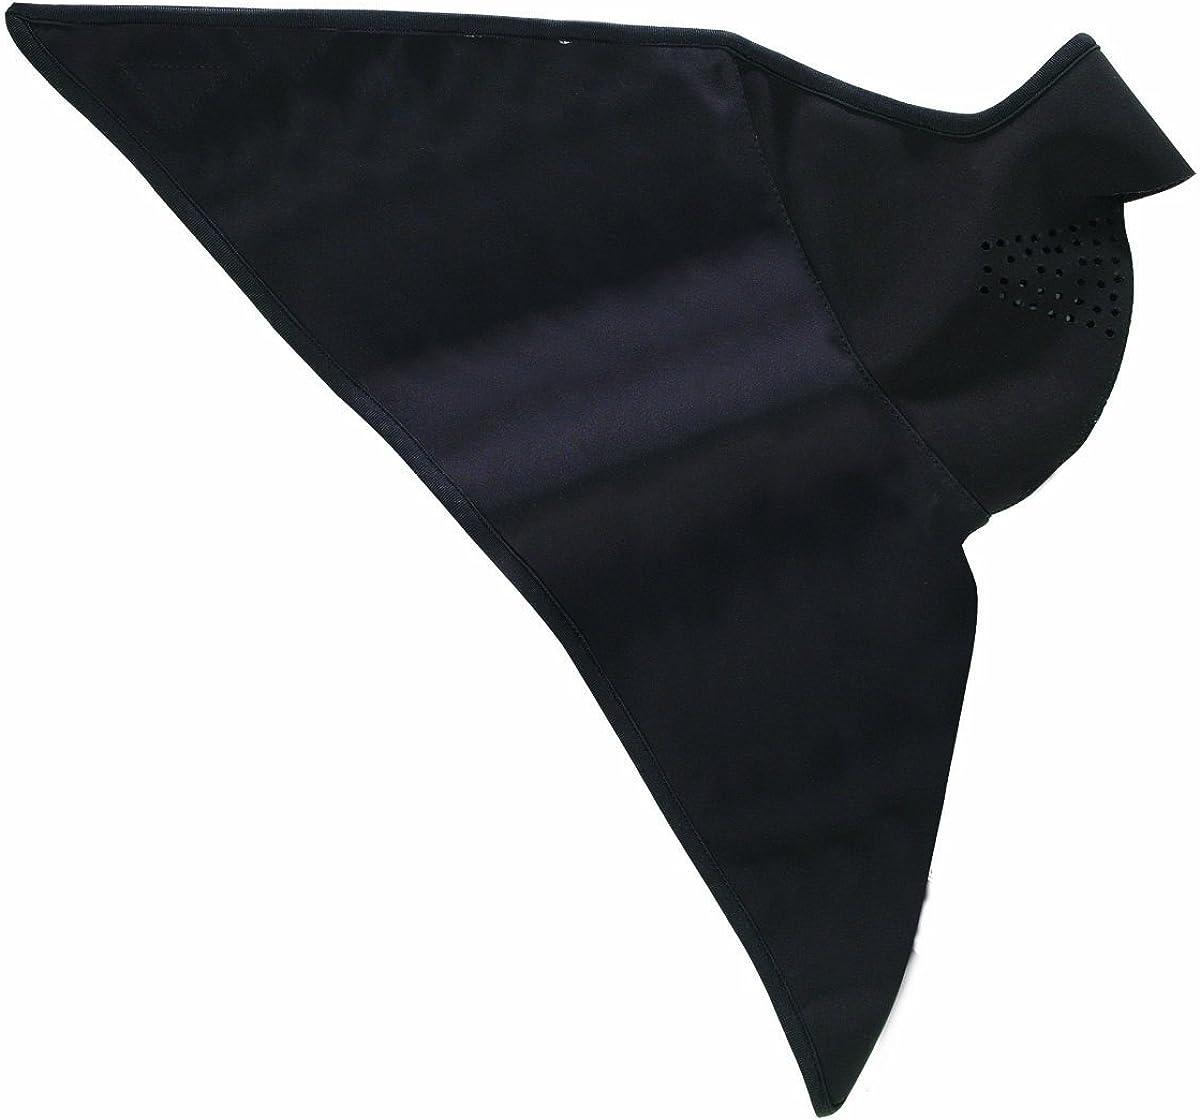 Seirus Innovation Softshell Combodana Facemask XS